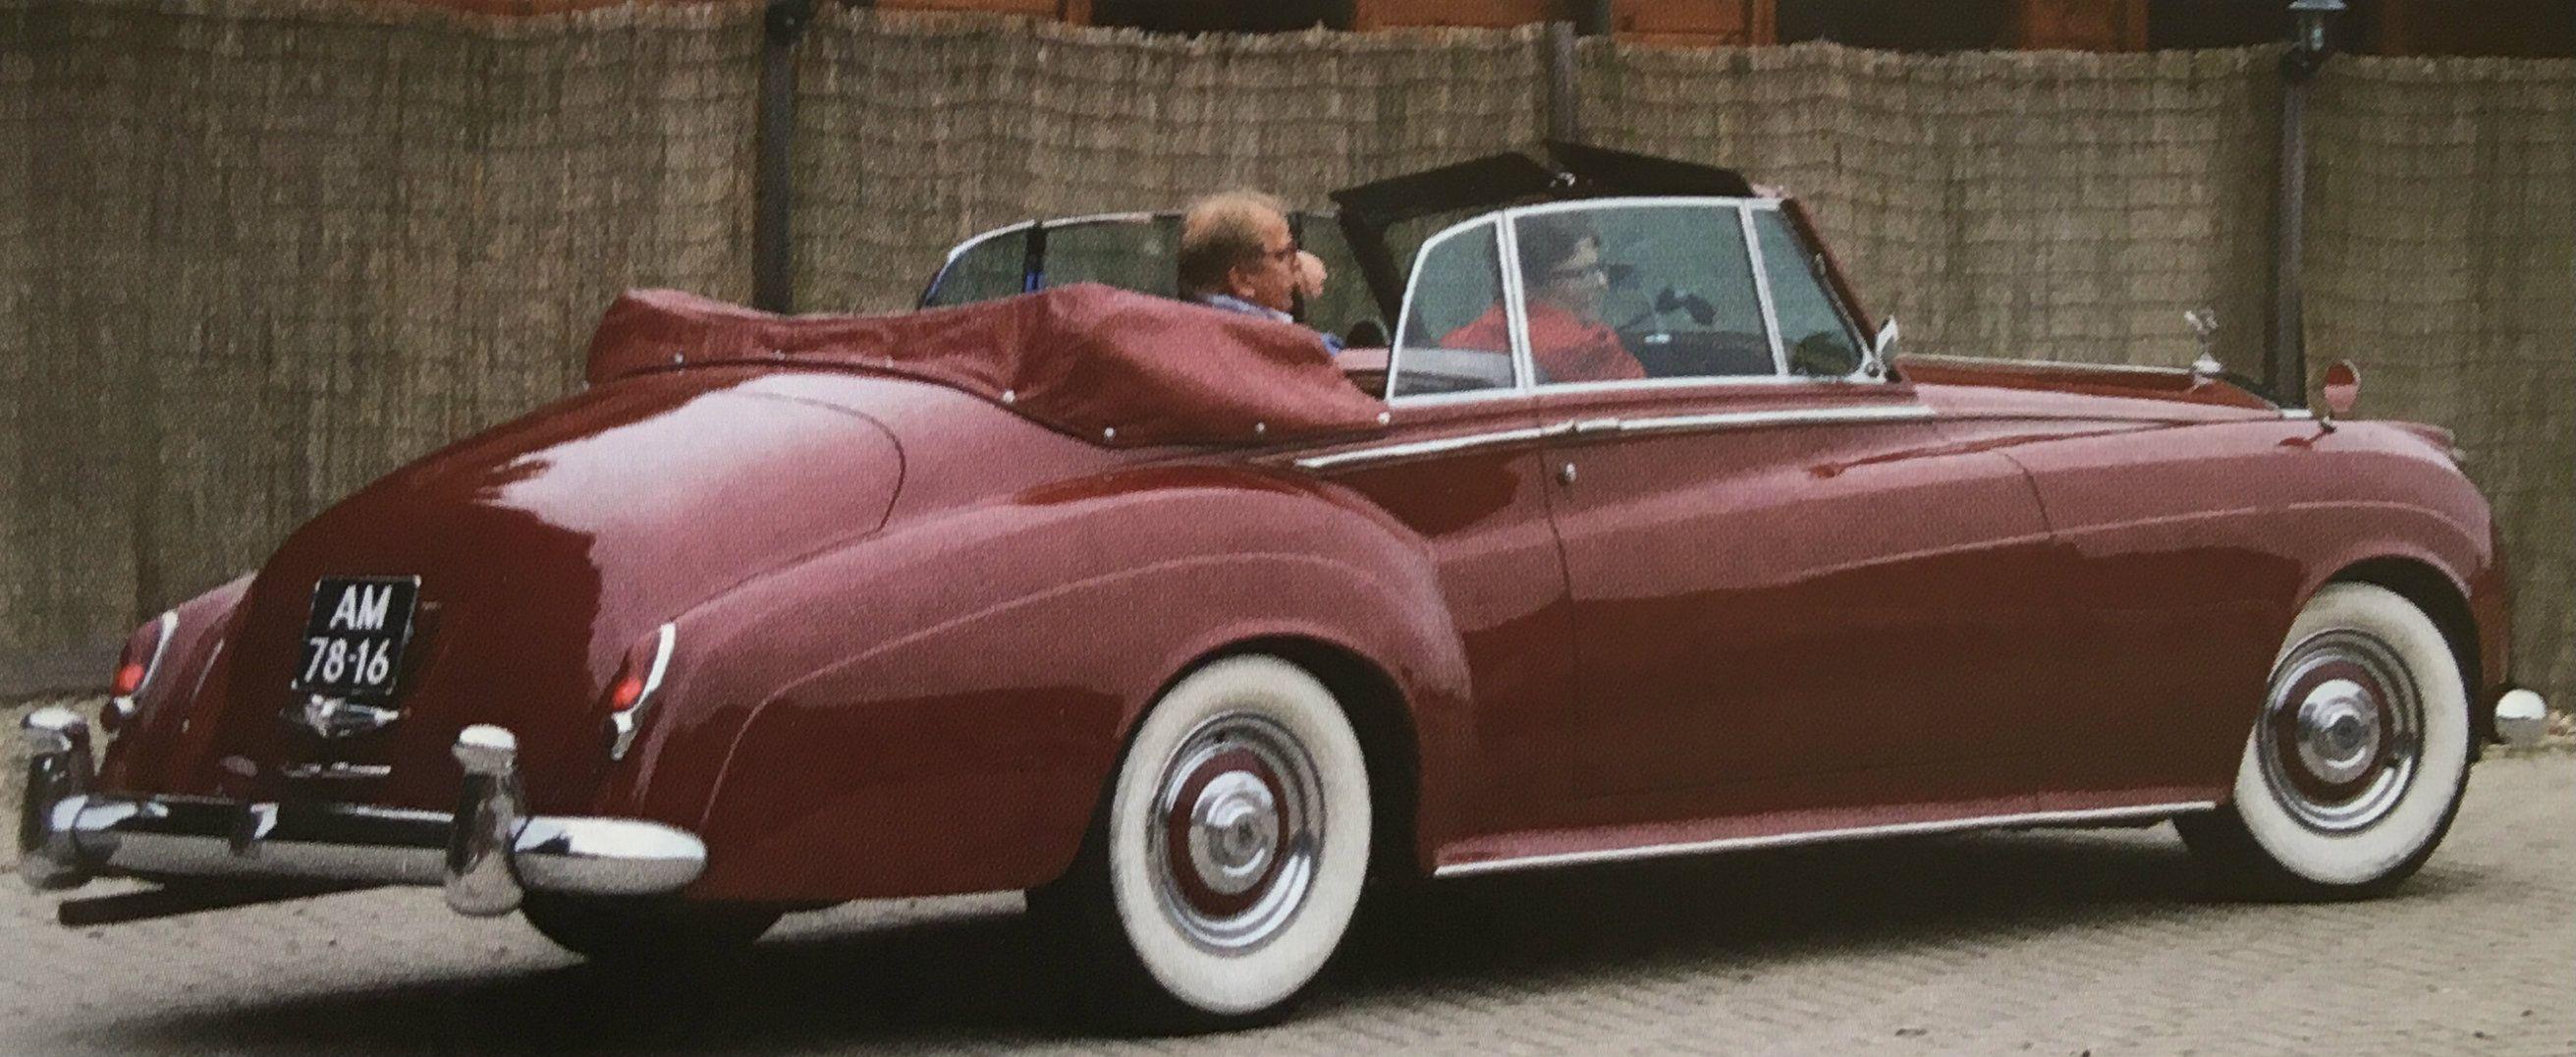 (1962) Convertible Coupé by H.J. Mulliner (design 7504)